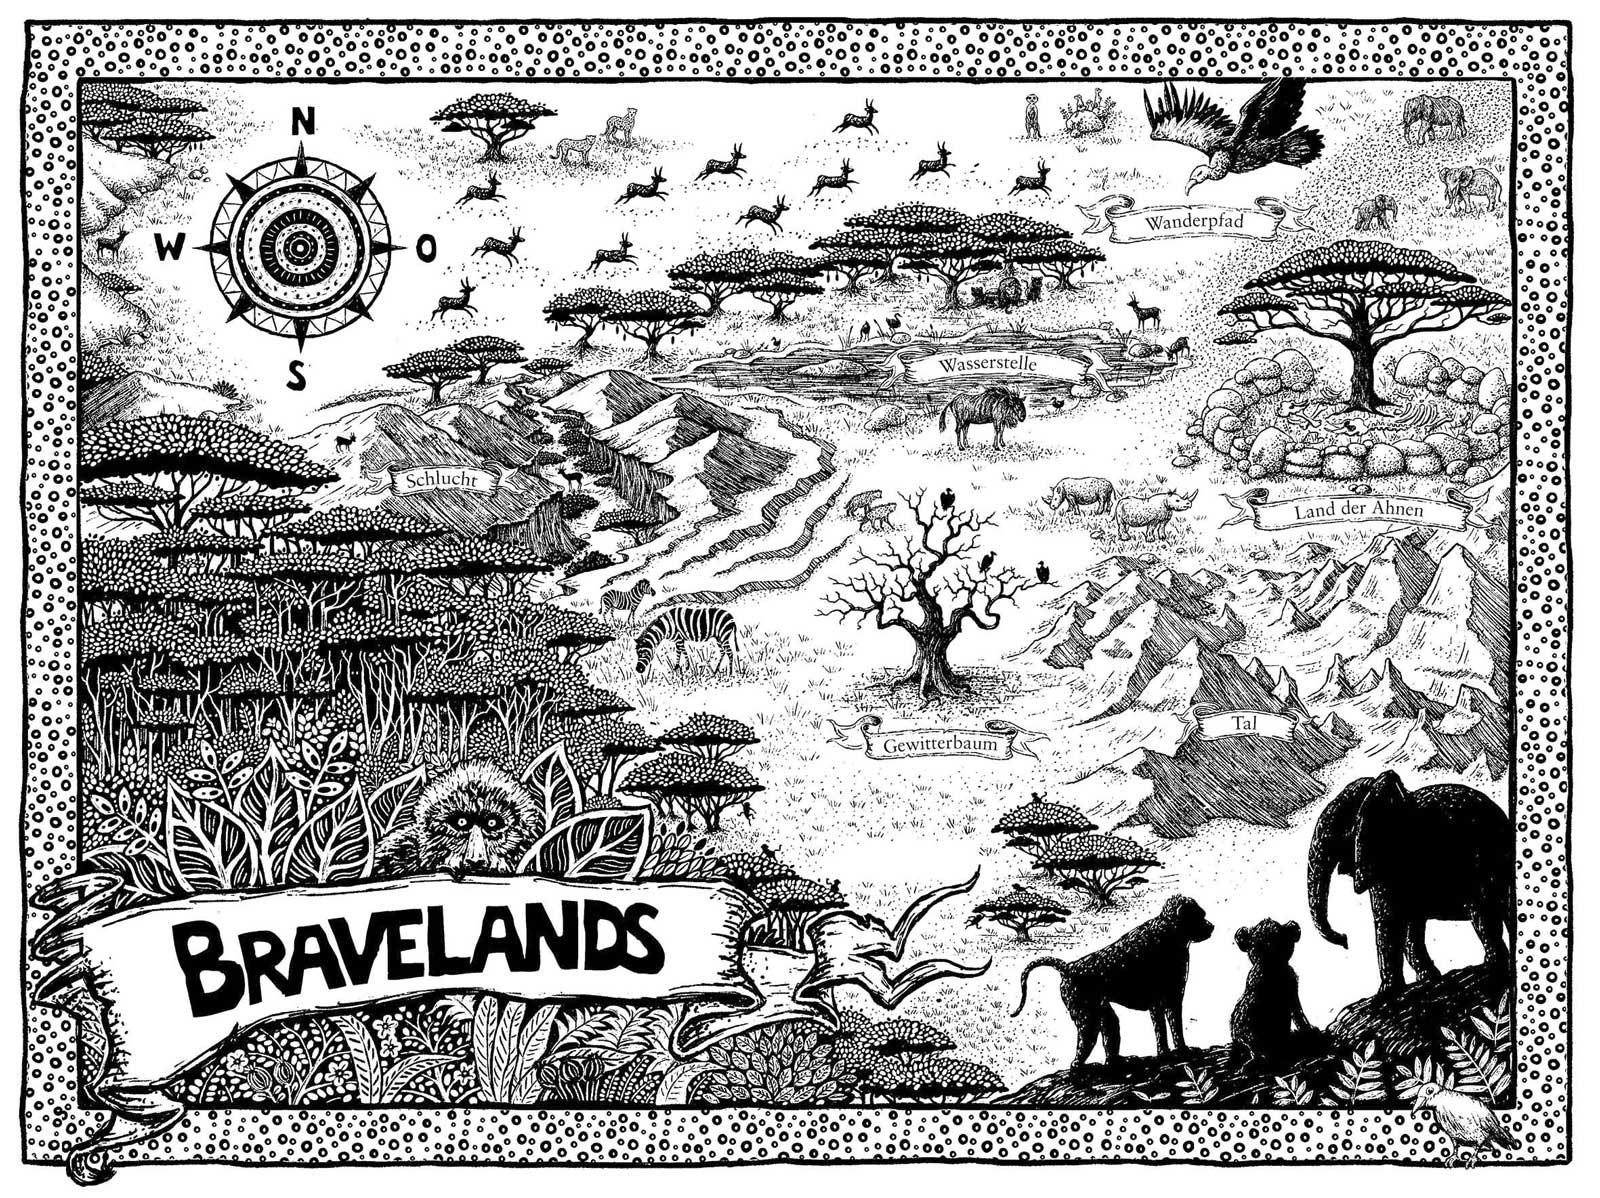 Die Bravelands - Karte